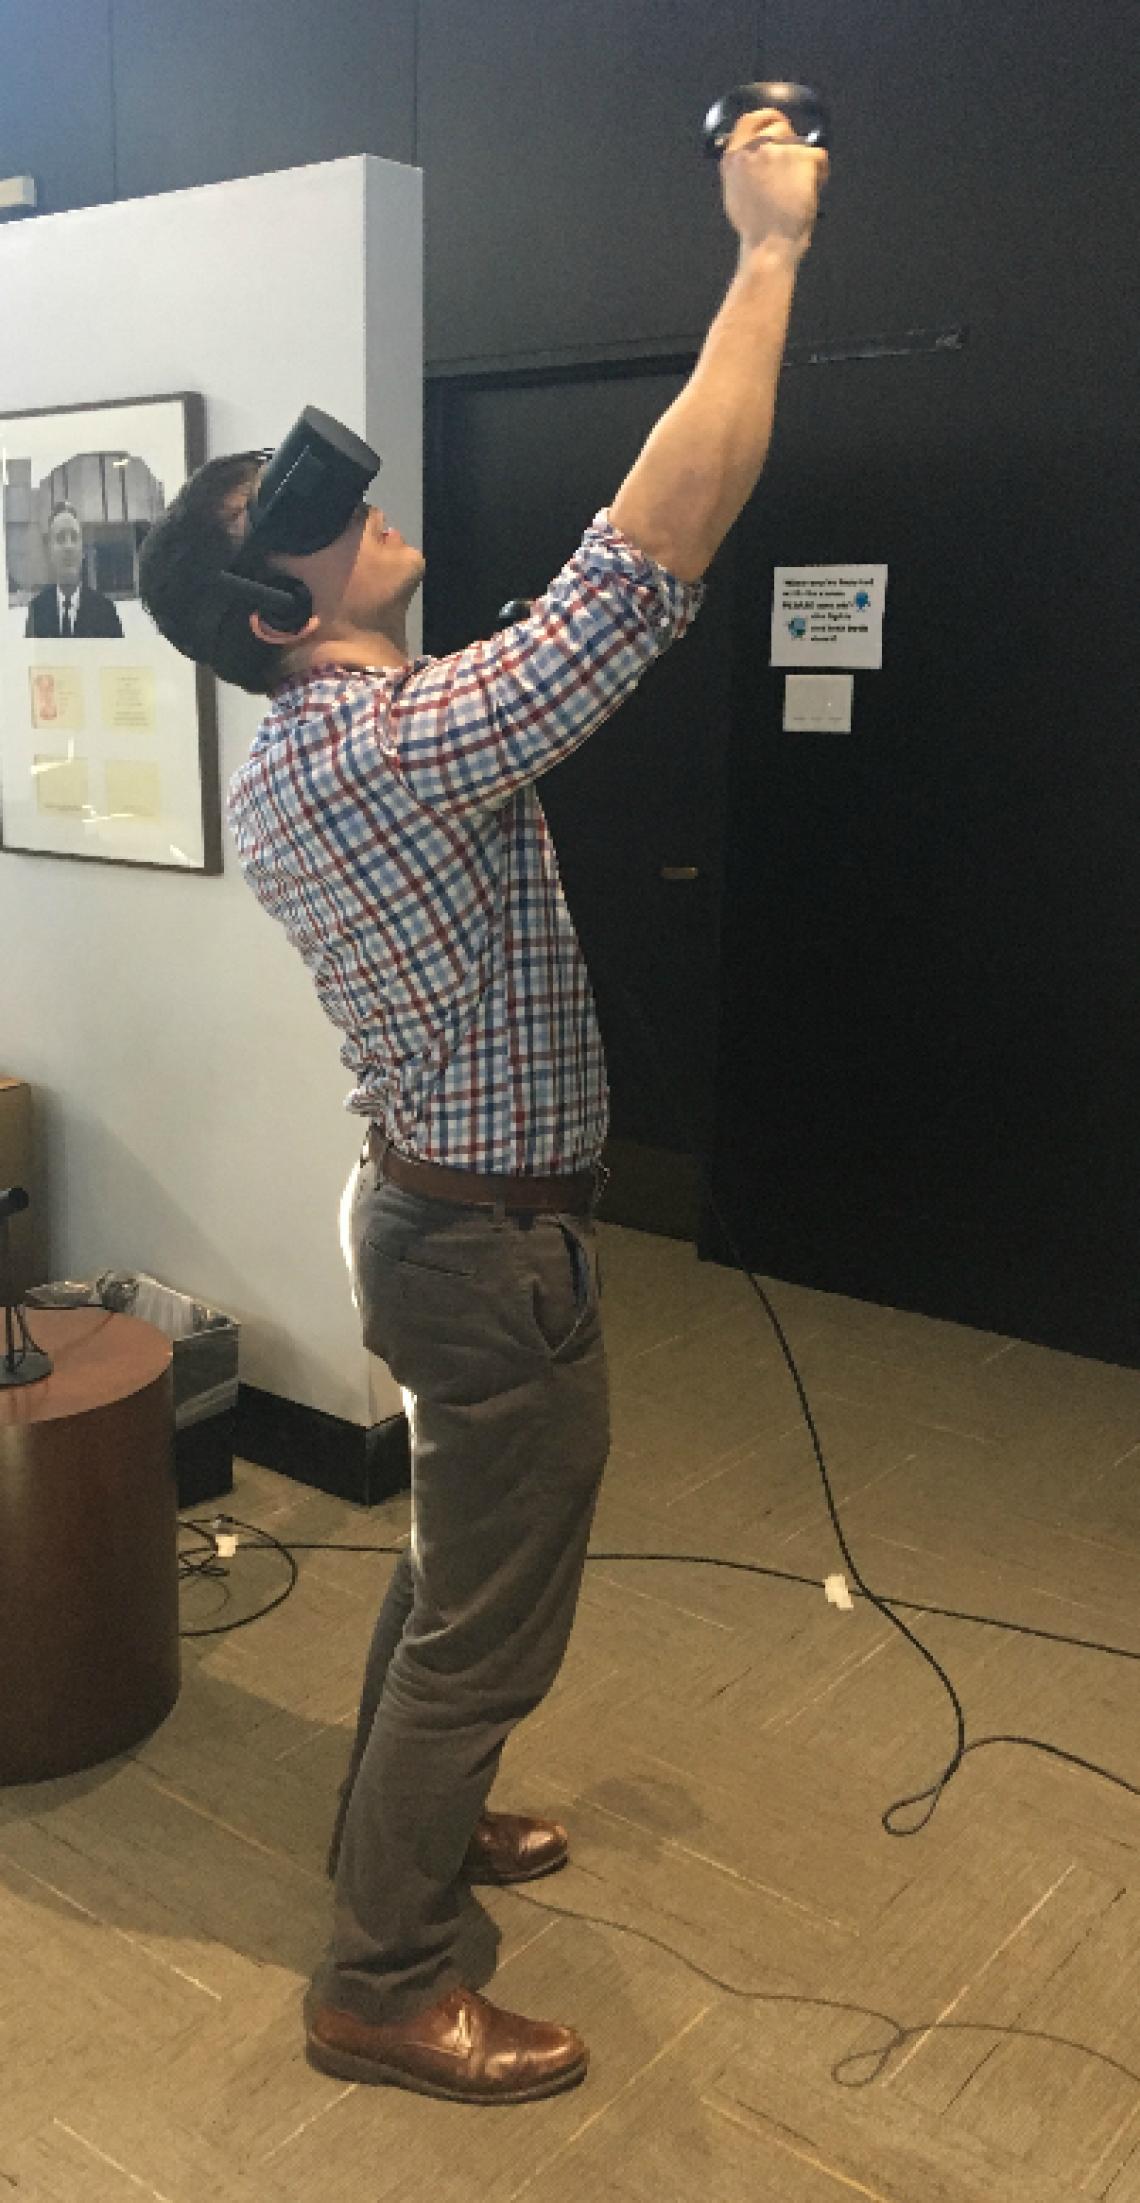 Wearing an Oculus Rift headset and handles to virtually rock climb